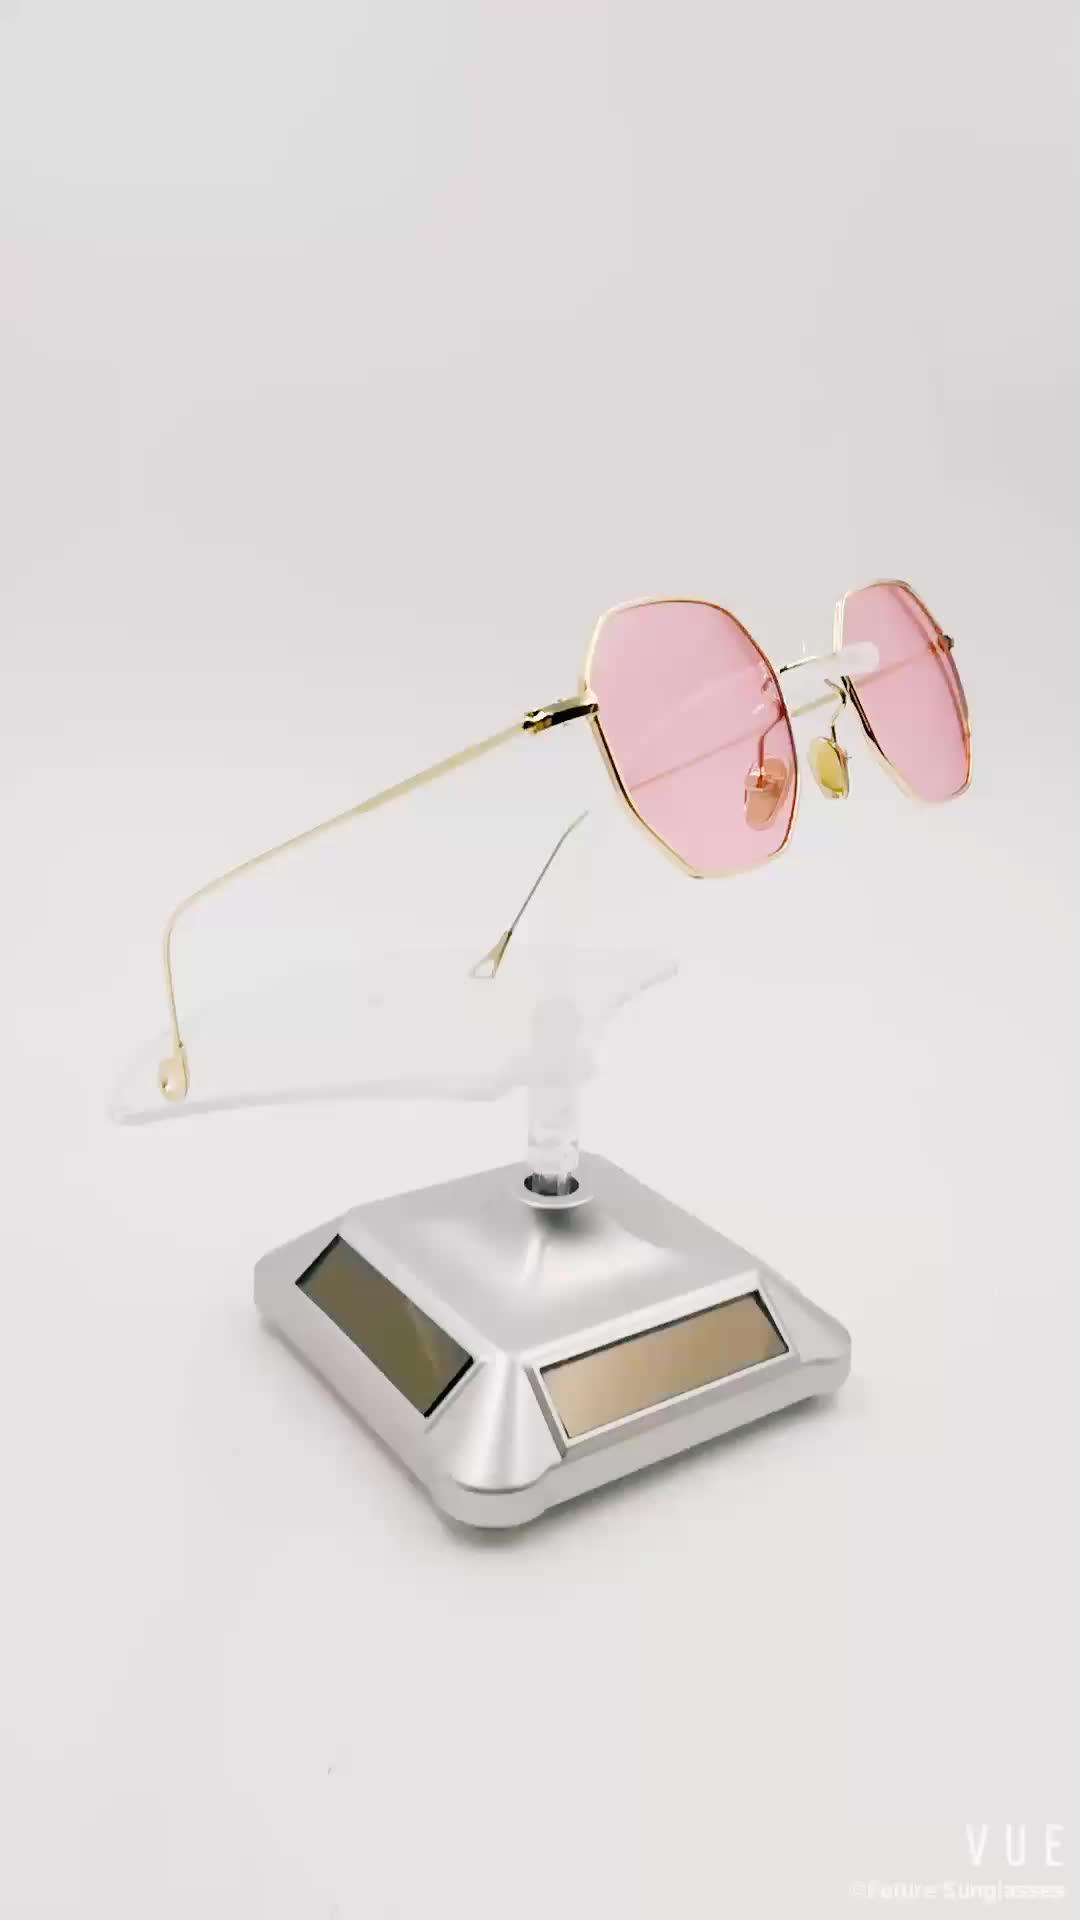 72026d54870e5 6660 Designer Hexagon Chic Sunglasses Womens Summer Alloy Frame Clear Red  Ocean Lens Small Metal Frame